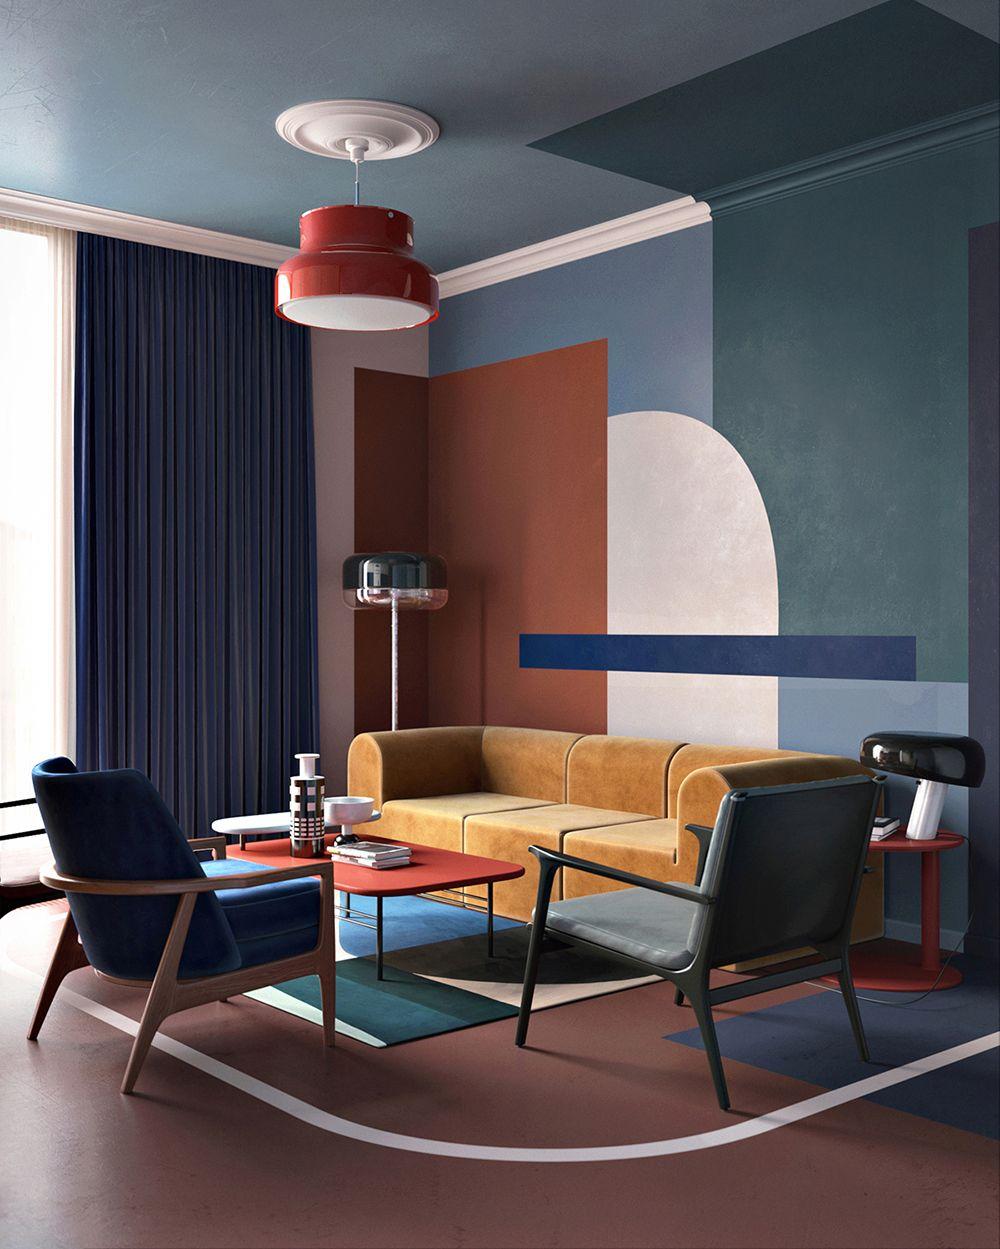 Utopia saarhouse pinterest behance interiors and living rooms